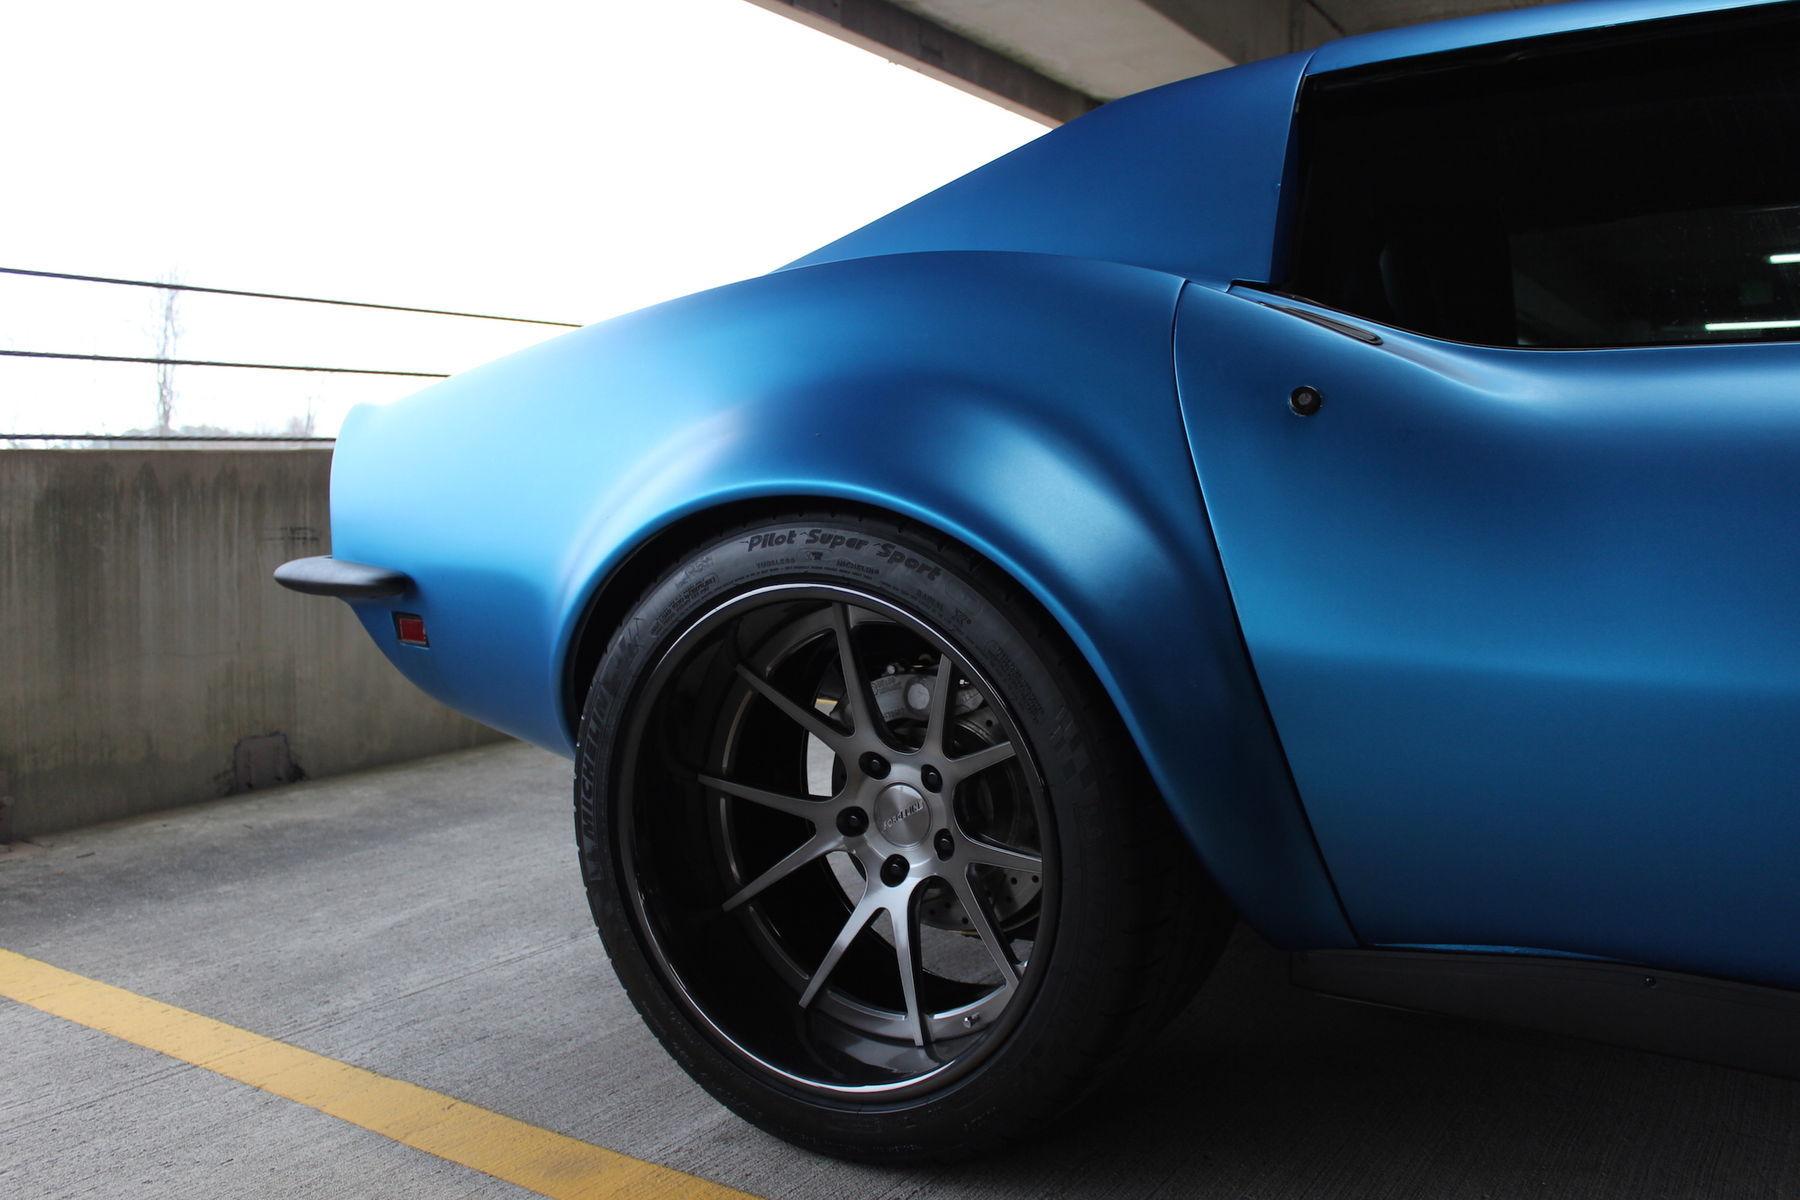 1969 Chevrolet Corvette Stingray | Chris Wylie's 1969 C3 Corvette Stingray on Forgeline GA3C Concave Wheels